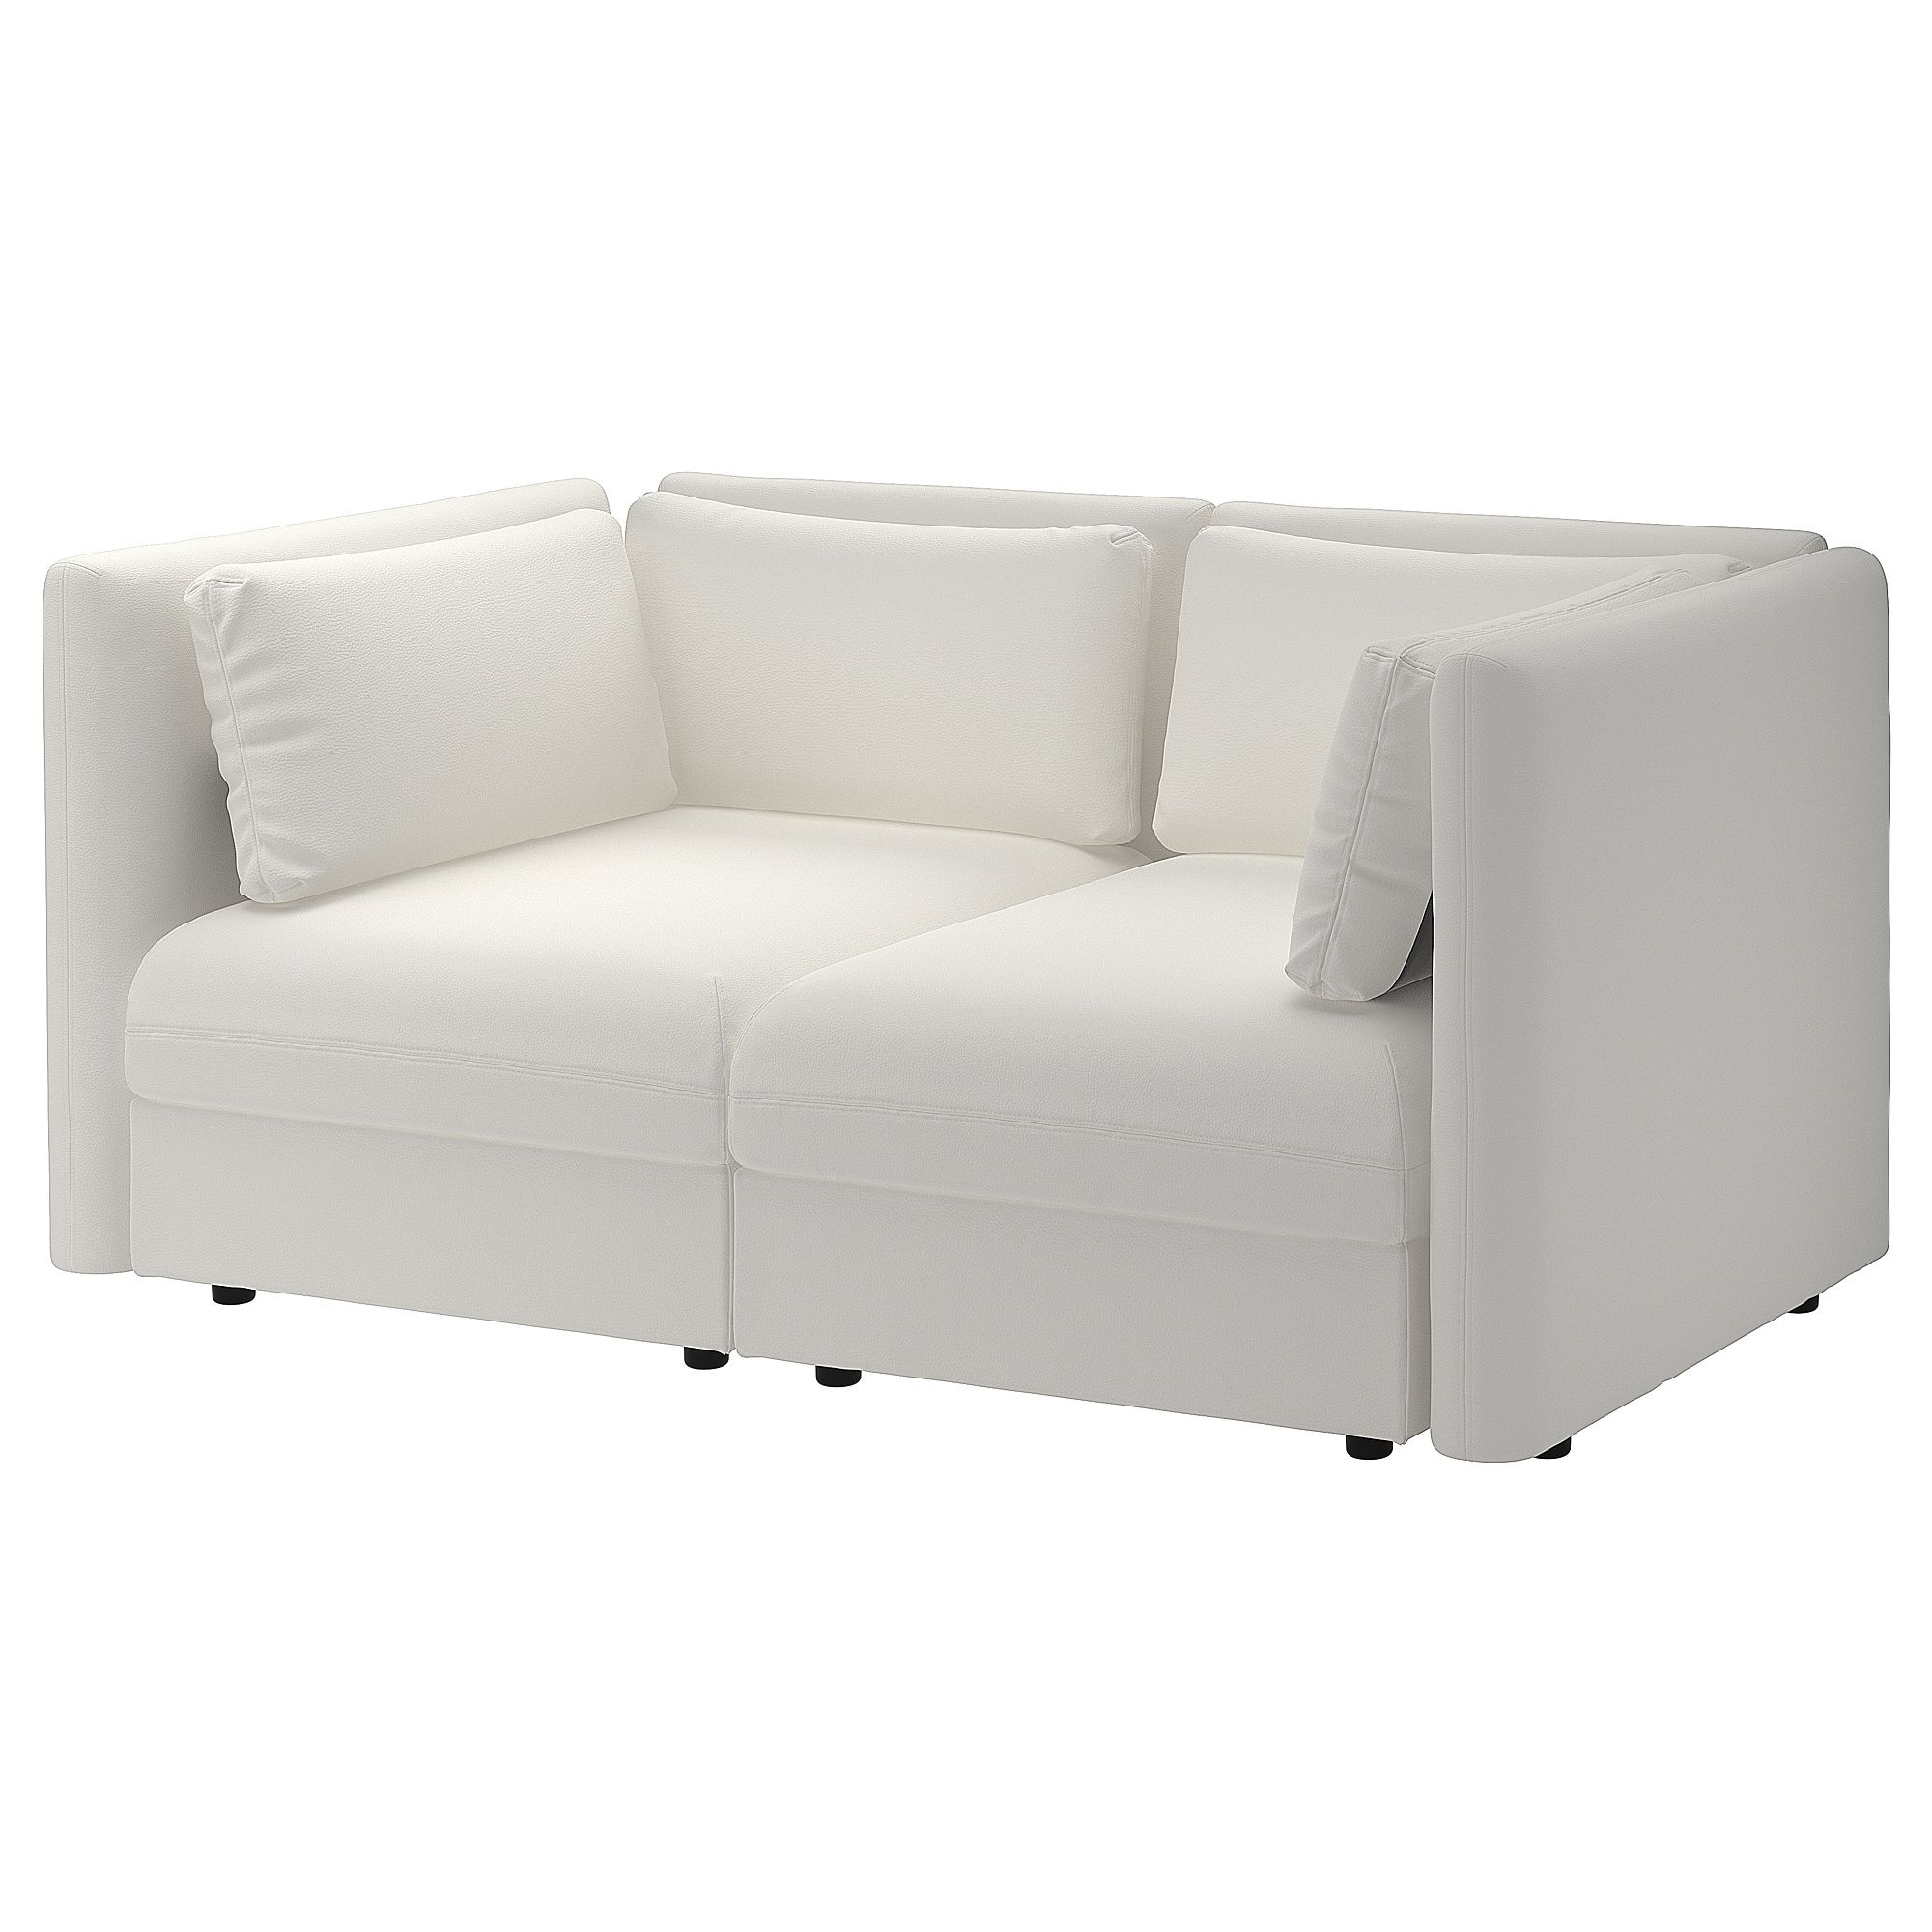 Love Seats Stoelen.Vallentuna Modular Loveseat Murum White Slaapkamer